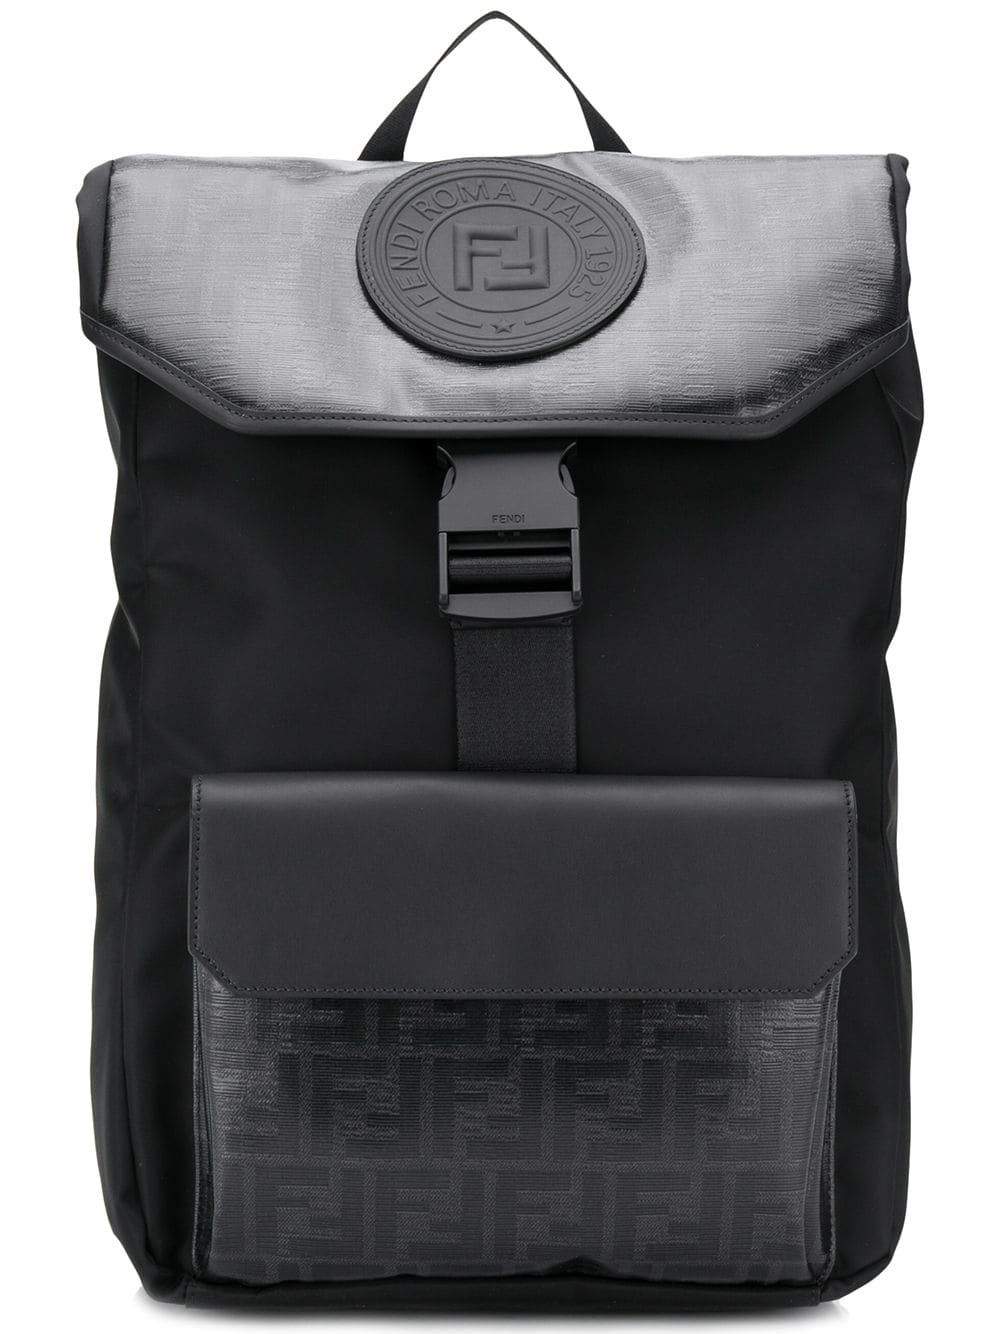 49d298c36 FENDI FENDI MONOGRAM BACKPACK - BLACK. #fendi #bags #leather #backpacks